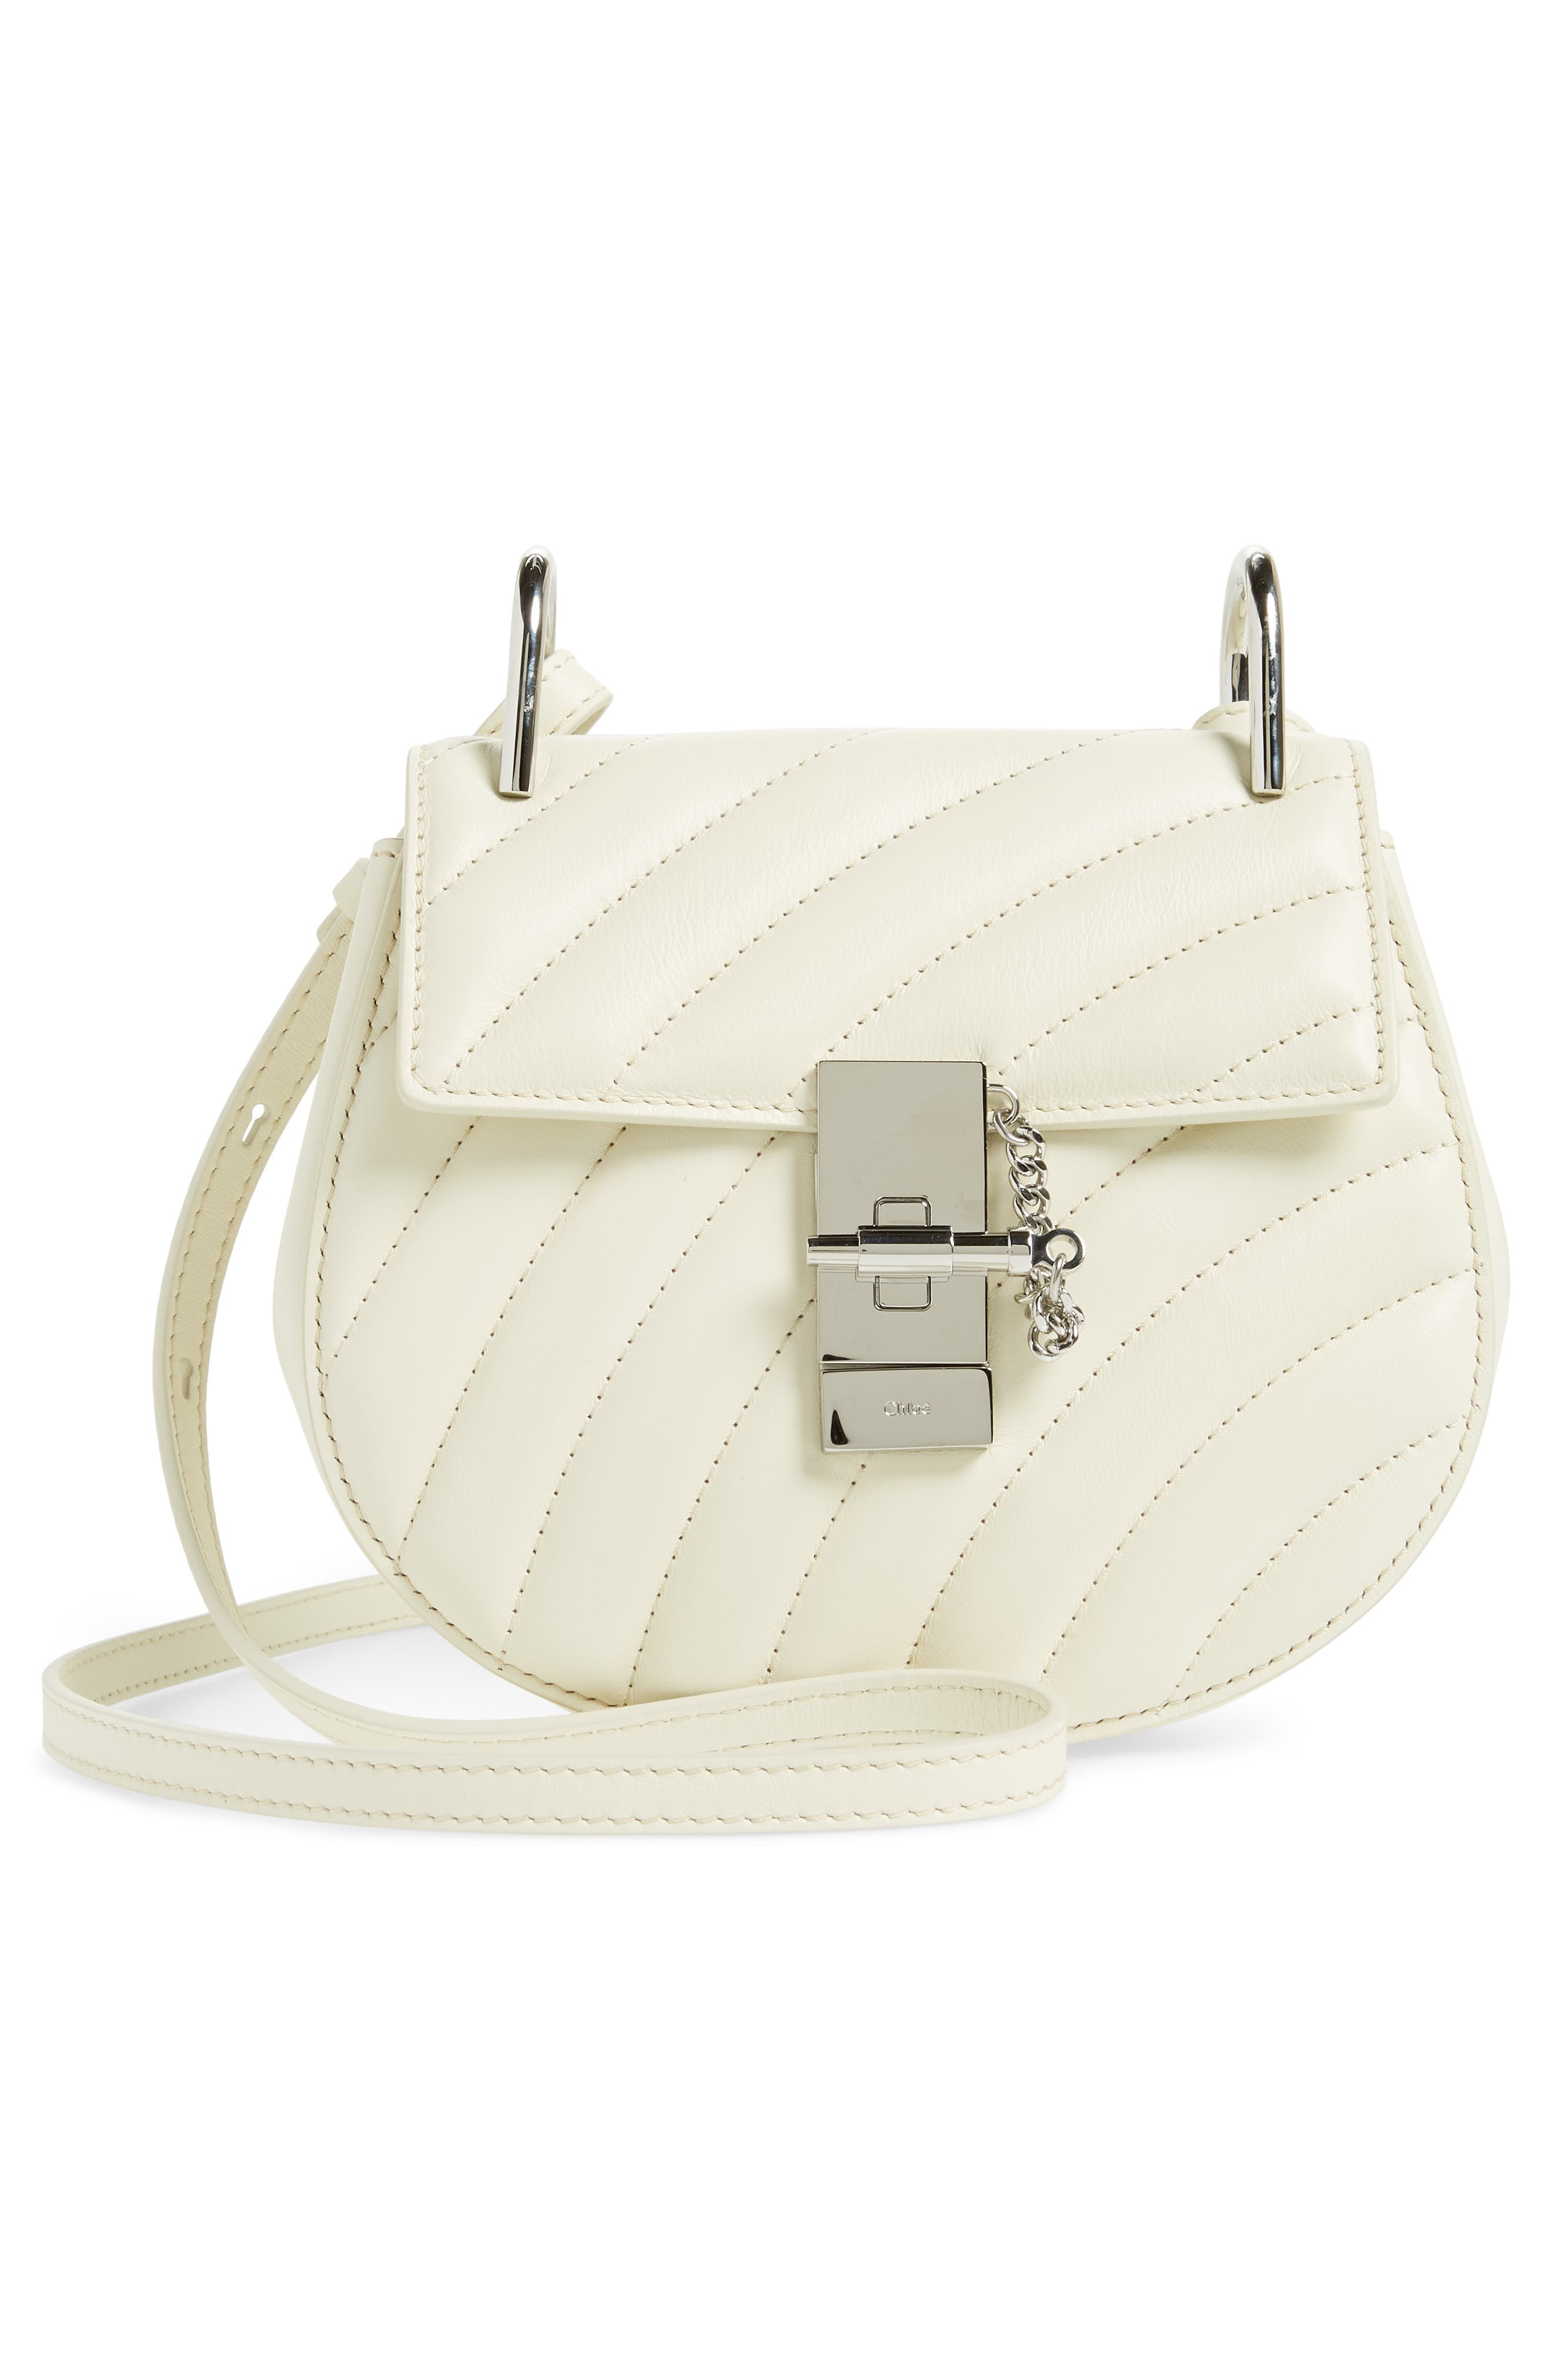 Mini Drew Bijoux Leather Shoulder Bag,                             Alternate thumbnail 9, color,                             Natural White